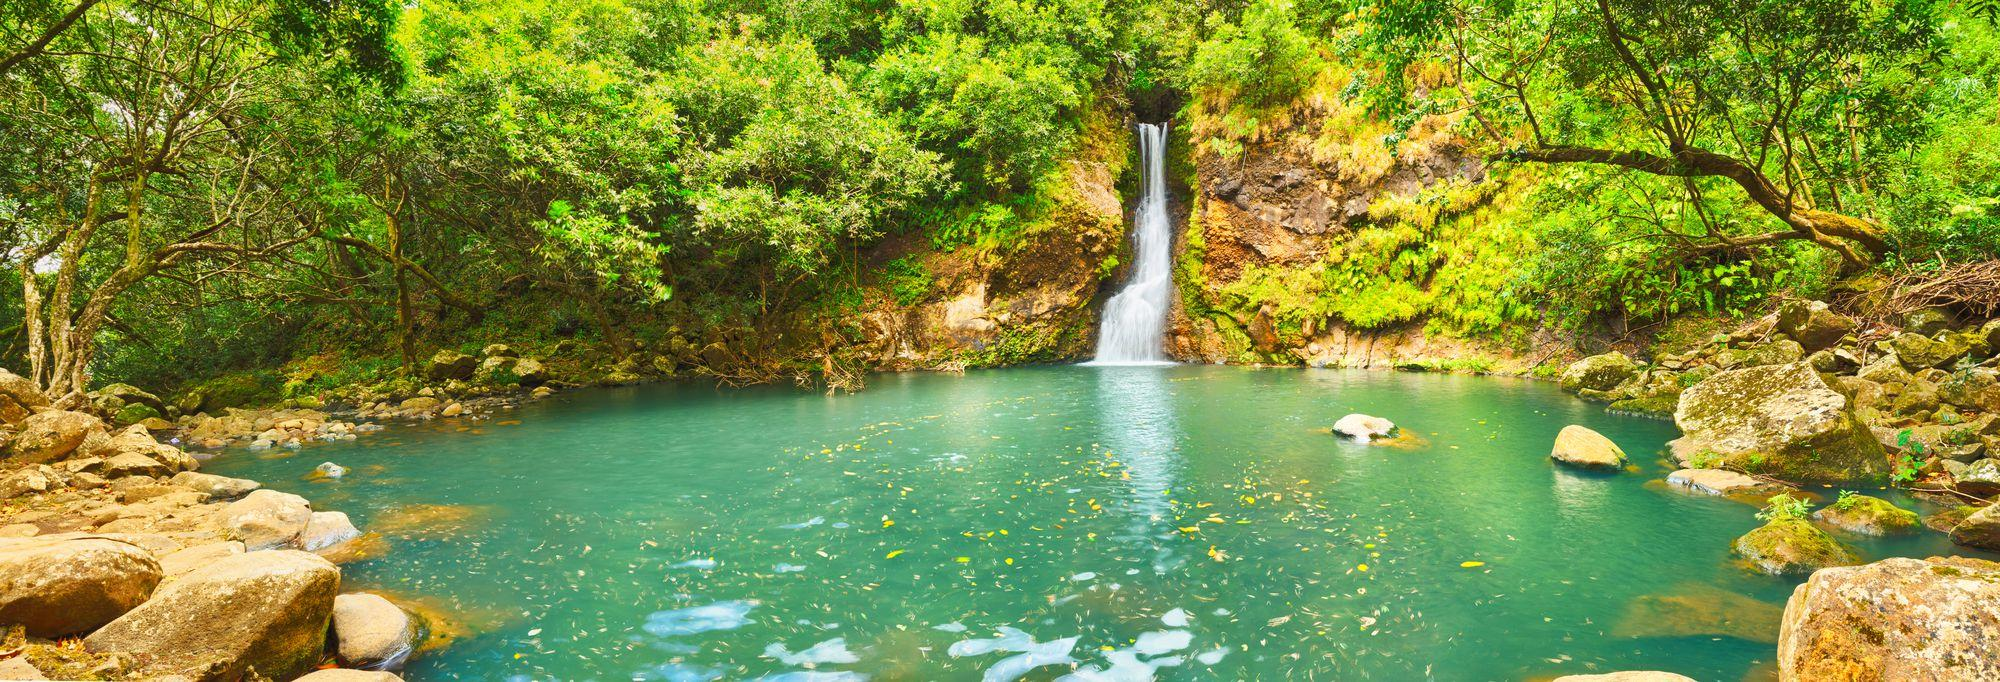 Scenic Cascade Chamouze waterfall, República de Mauricio